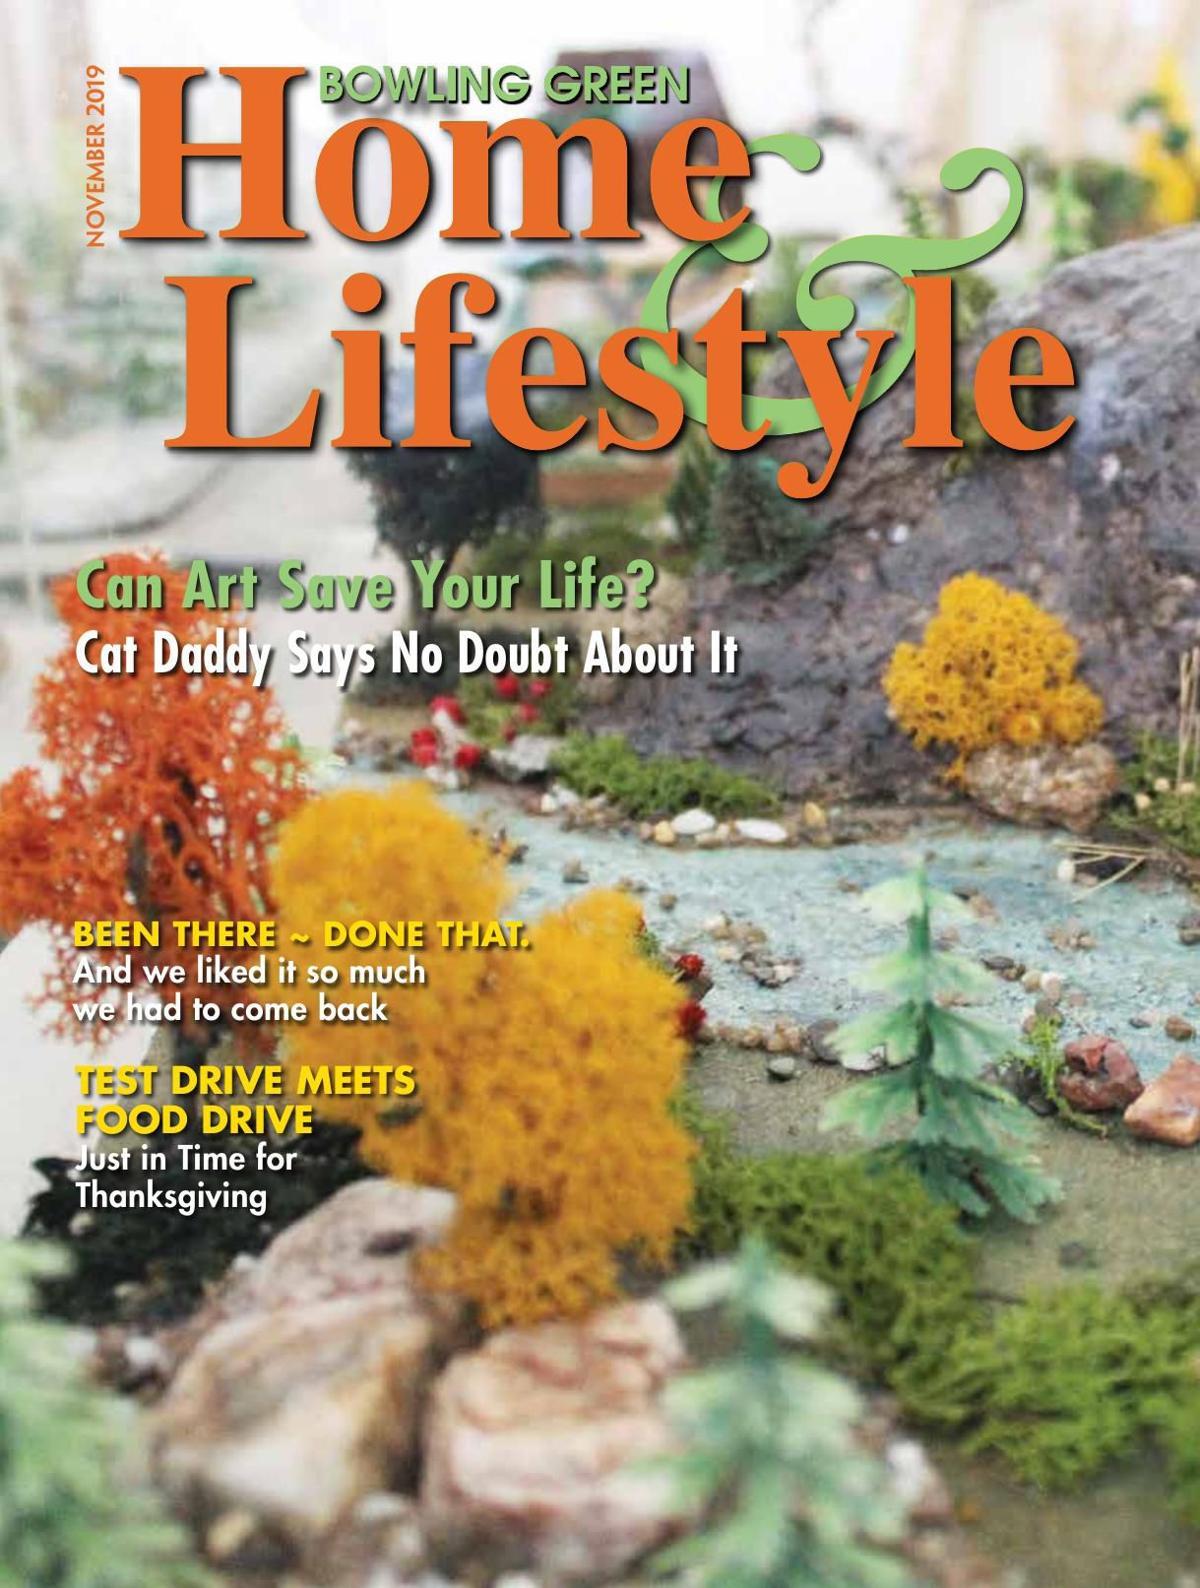 November BG Home & Lifestyle